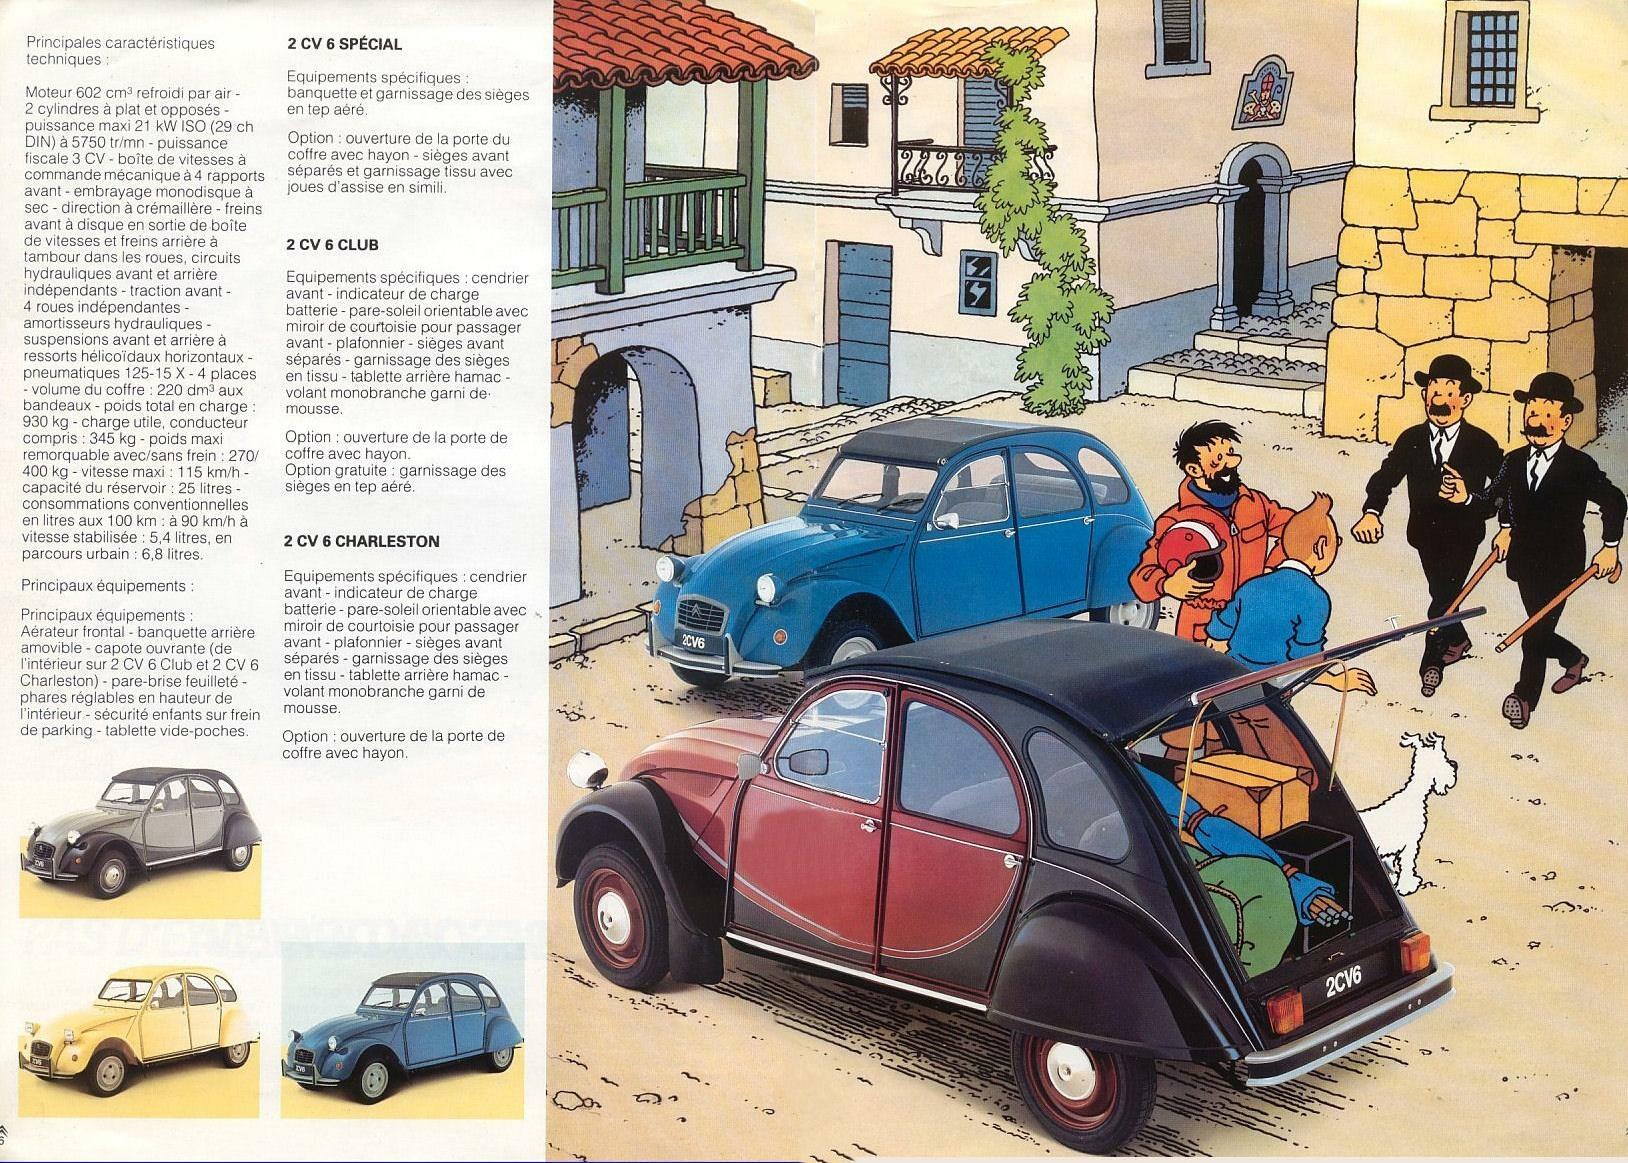 Citroen 2Cv For Sale >> Los coches en los cómics (I)